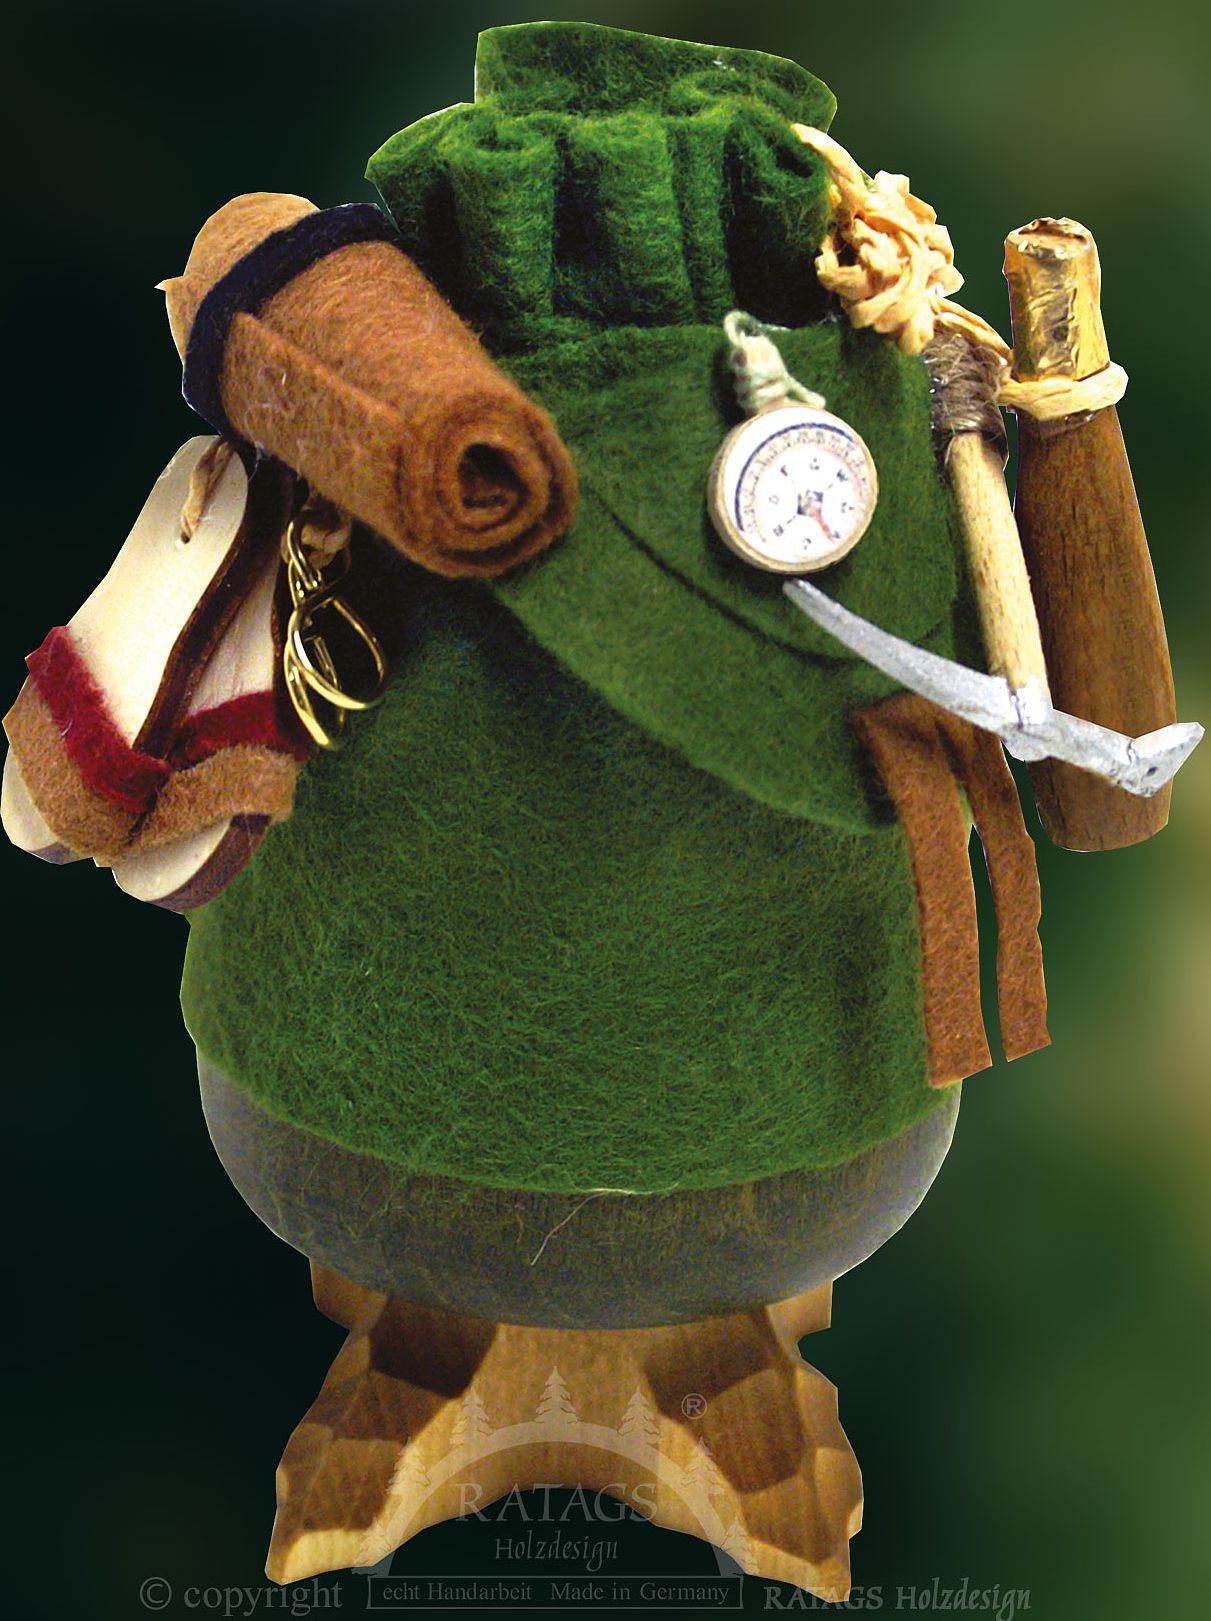 Ratags Räucherfigur Räuchersack, grün